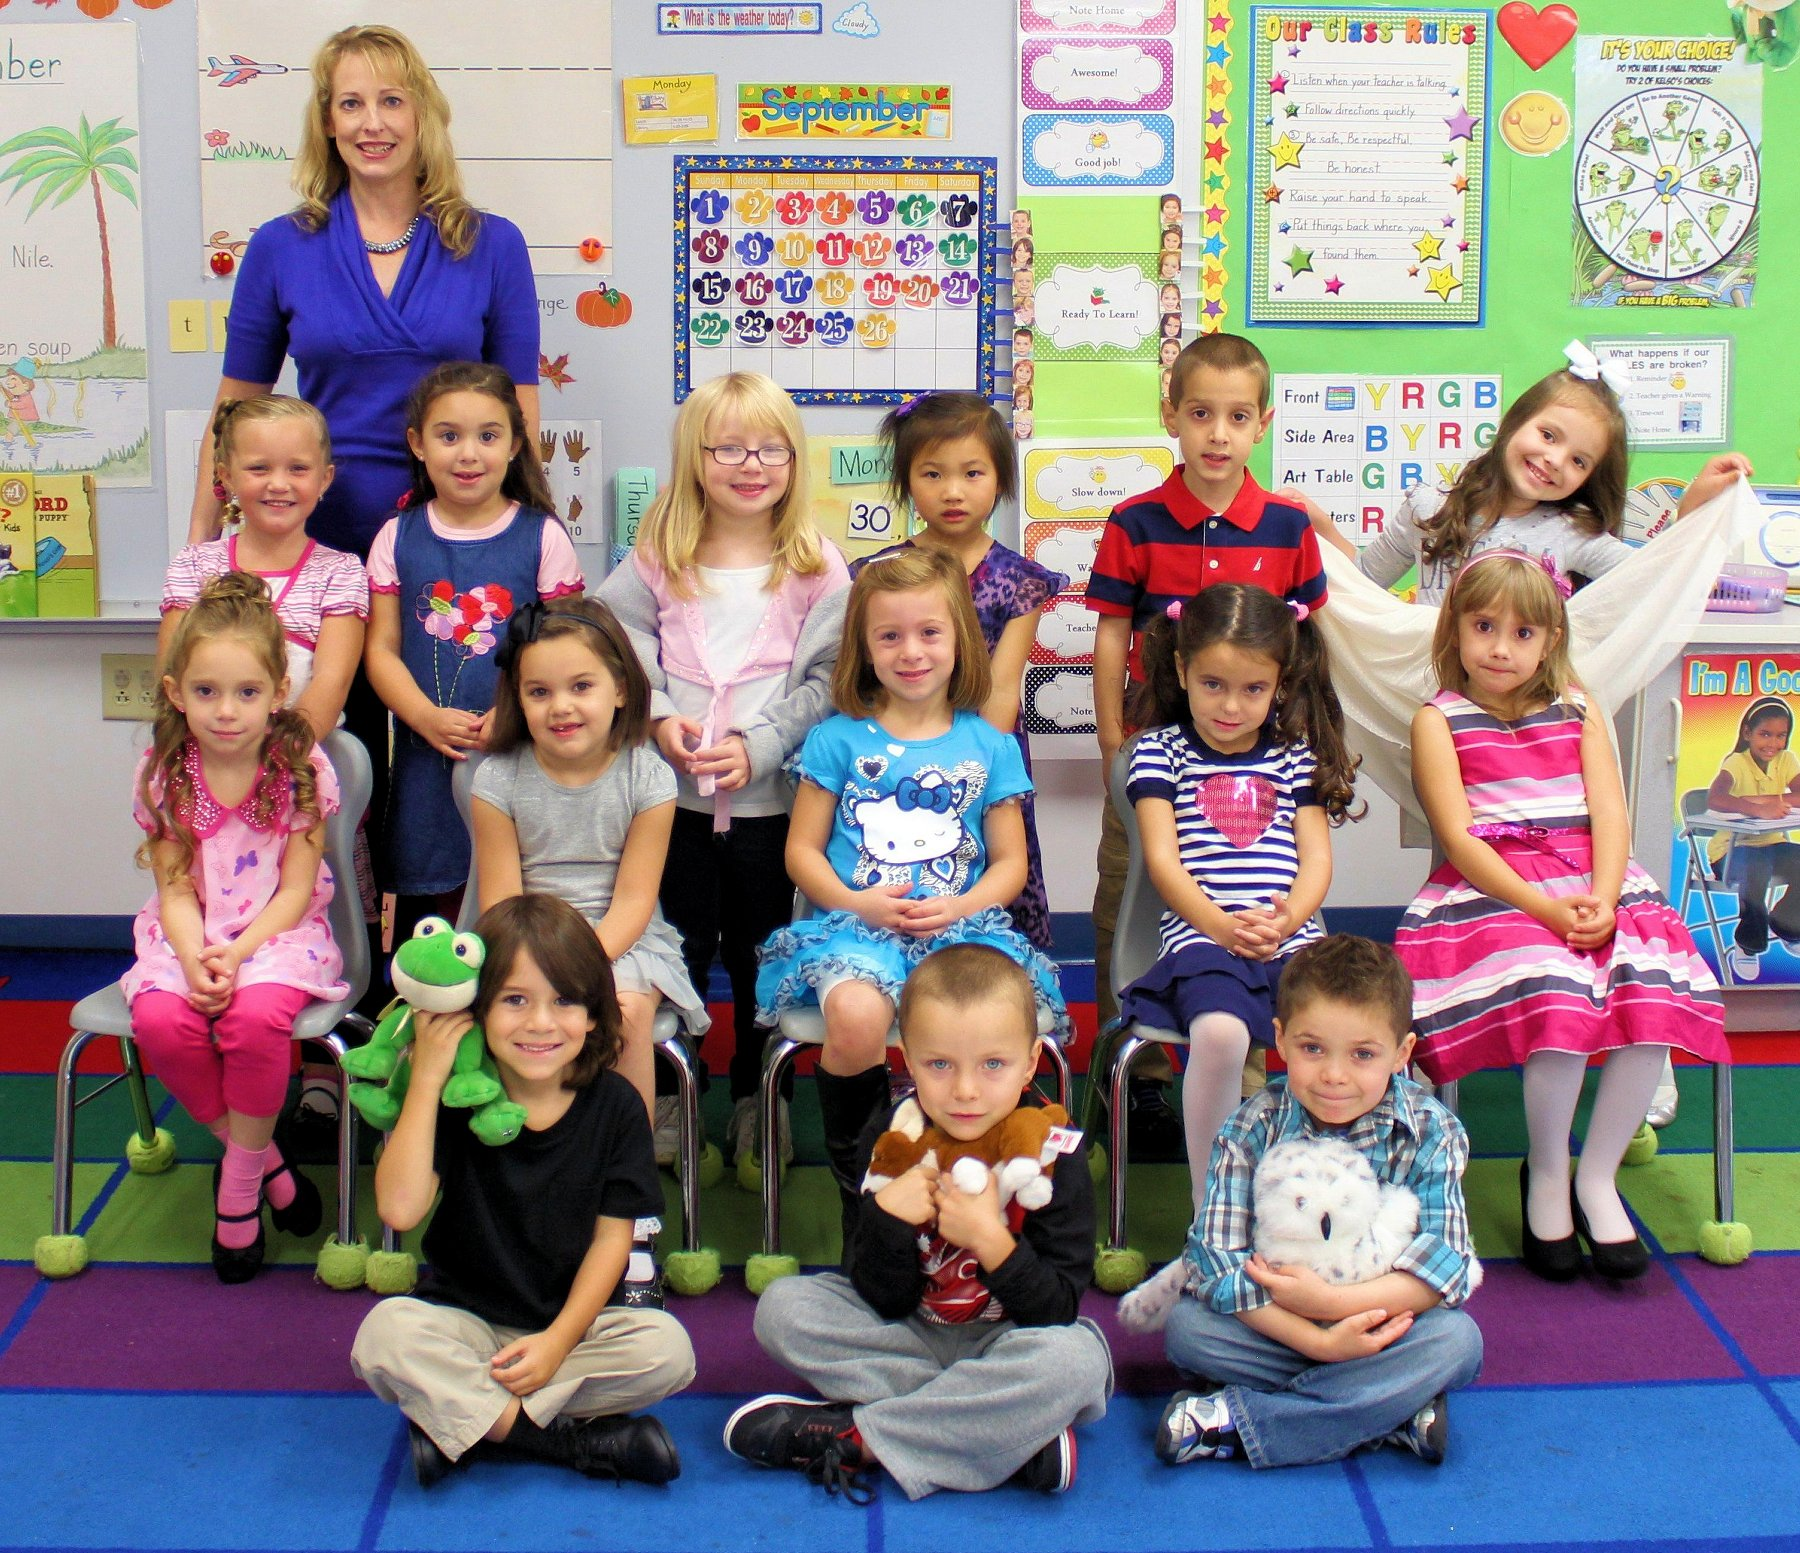 Kindergarten Classroom: Our Photo Album